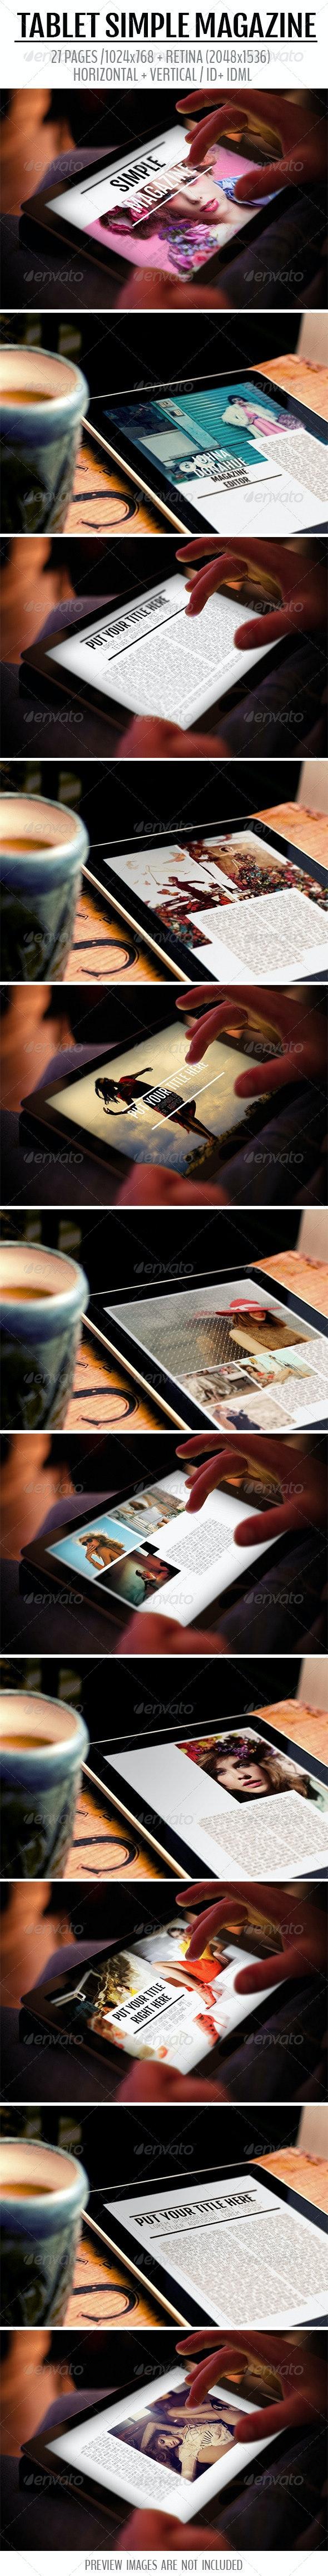 iPad & Tablet Simple Magazine - Digital Magazines ePublishing